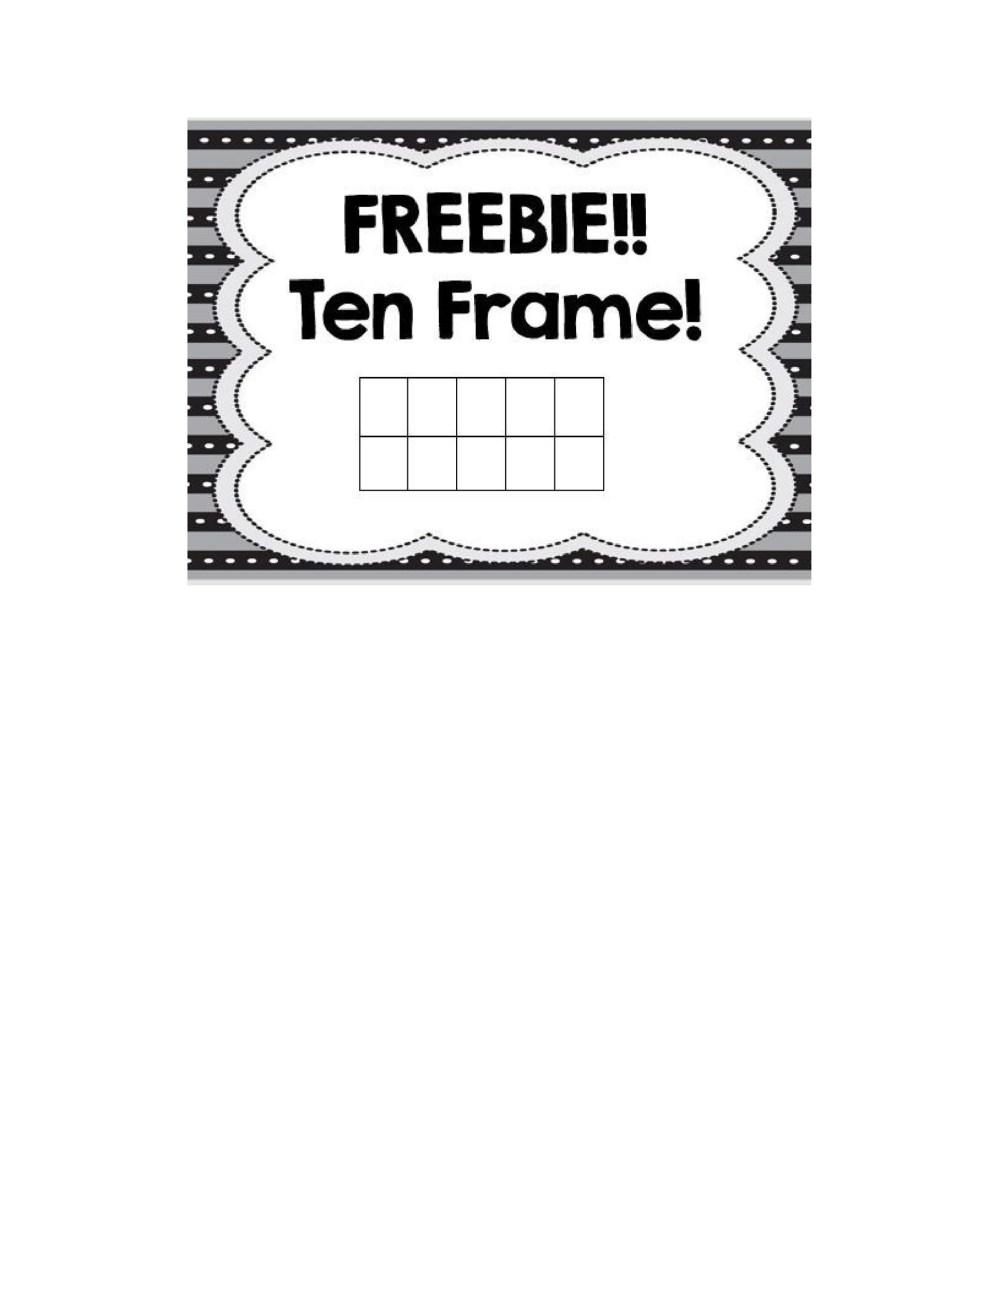 medium resolution of 36 Printable Ten Frame Templates (Free) ᐅ TemplateLab